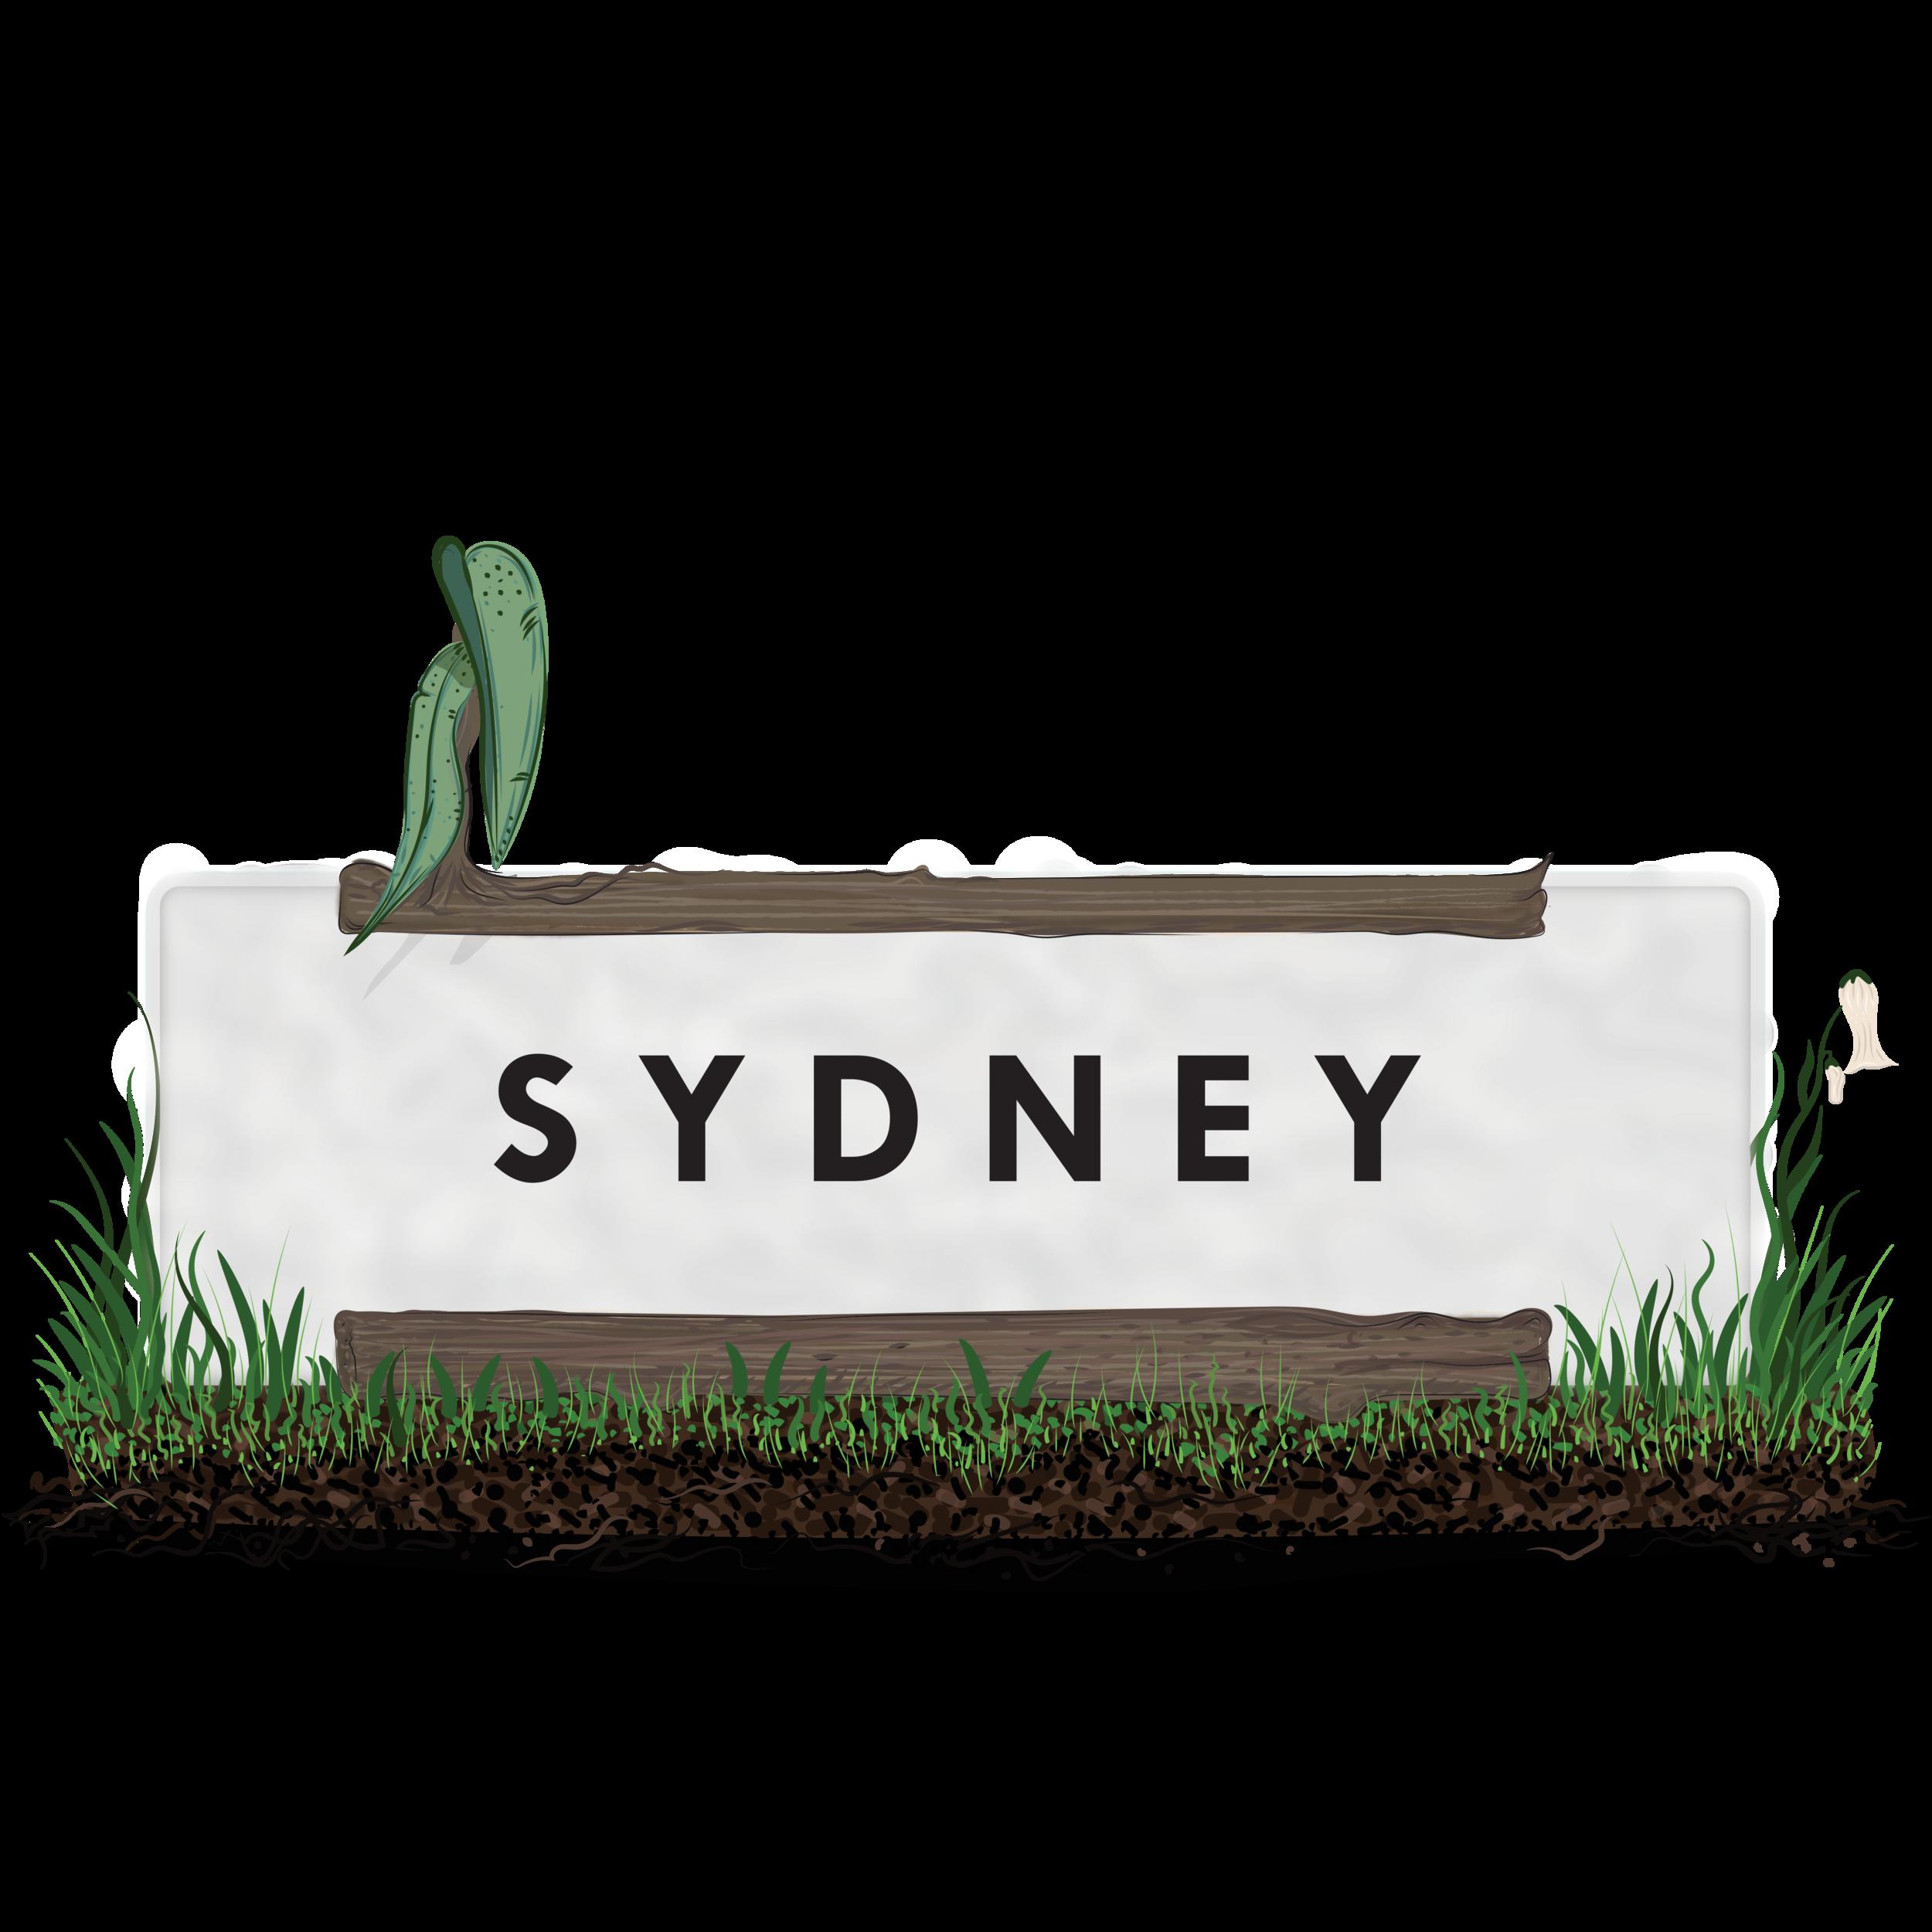 SYDNEY GRASS Landscape.png